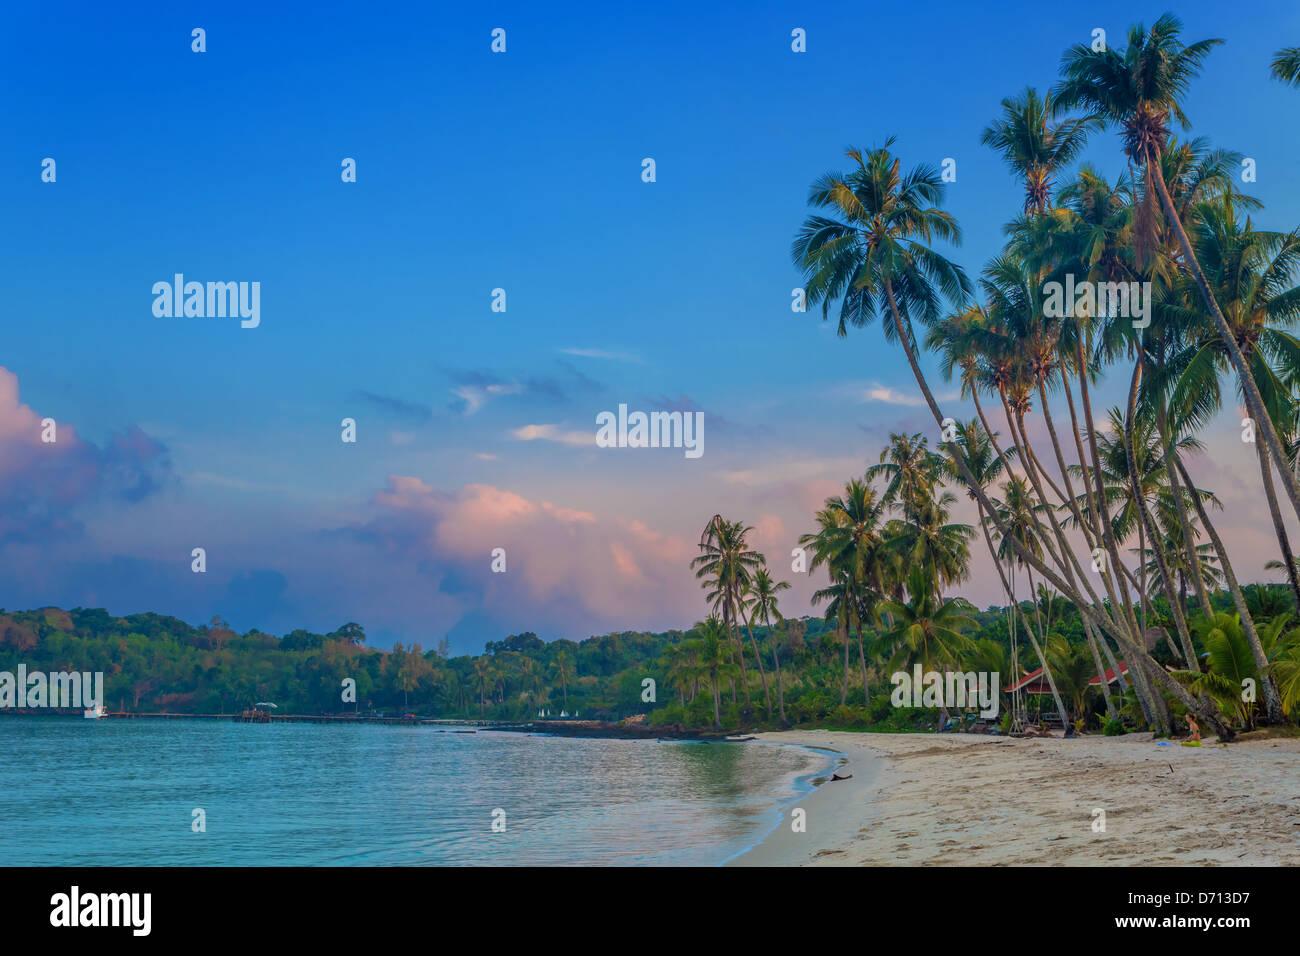 sunrise on a tropical beach - Stock Image